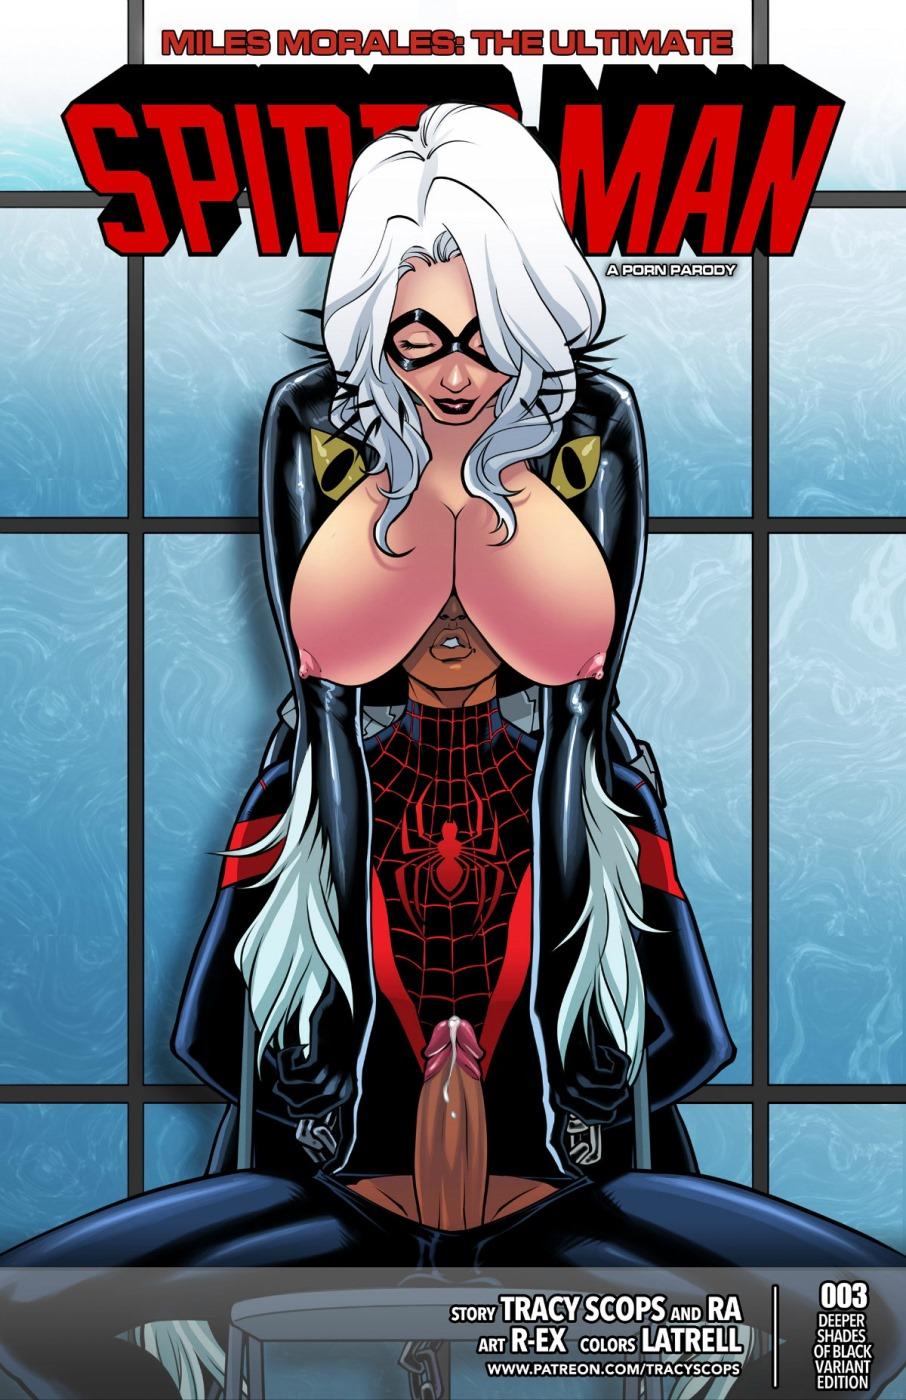 Porn Comics - Miles Morales- Ultimate Spider-Man 3 porn comics 8 muses